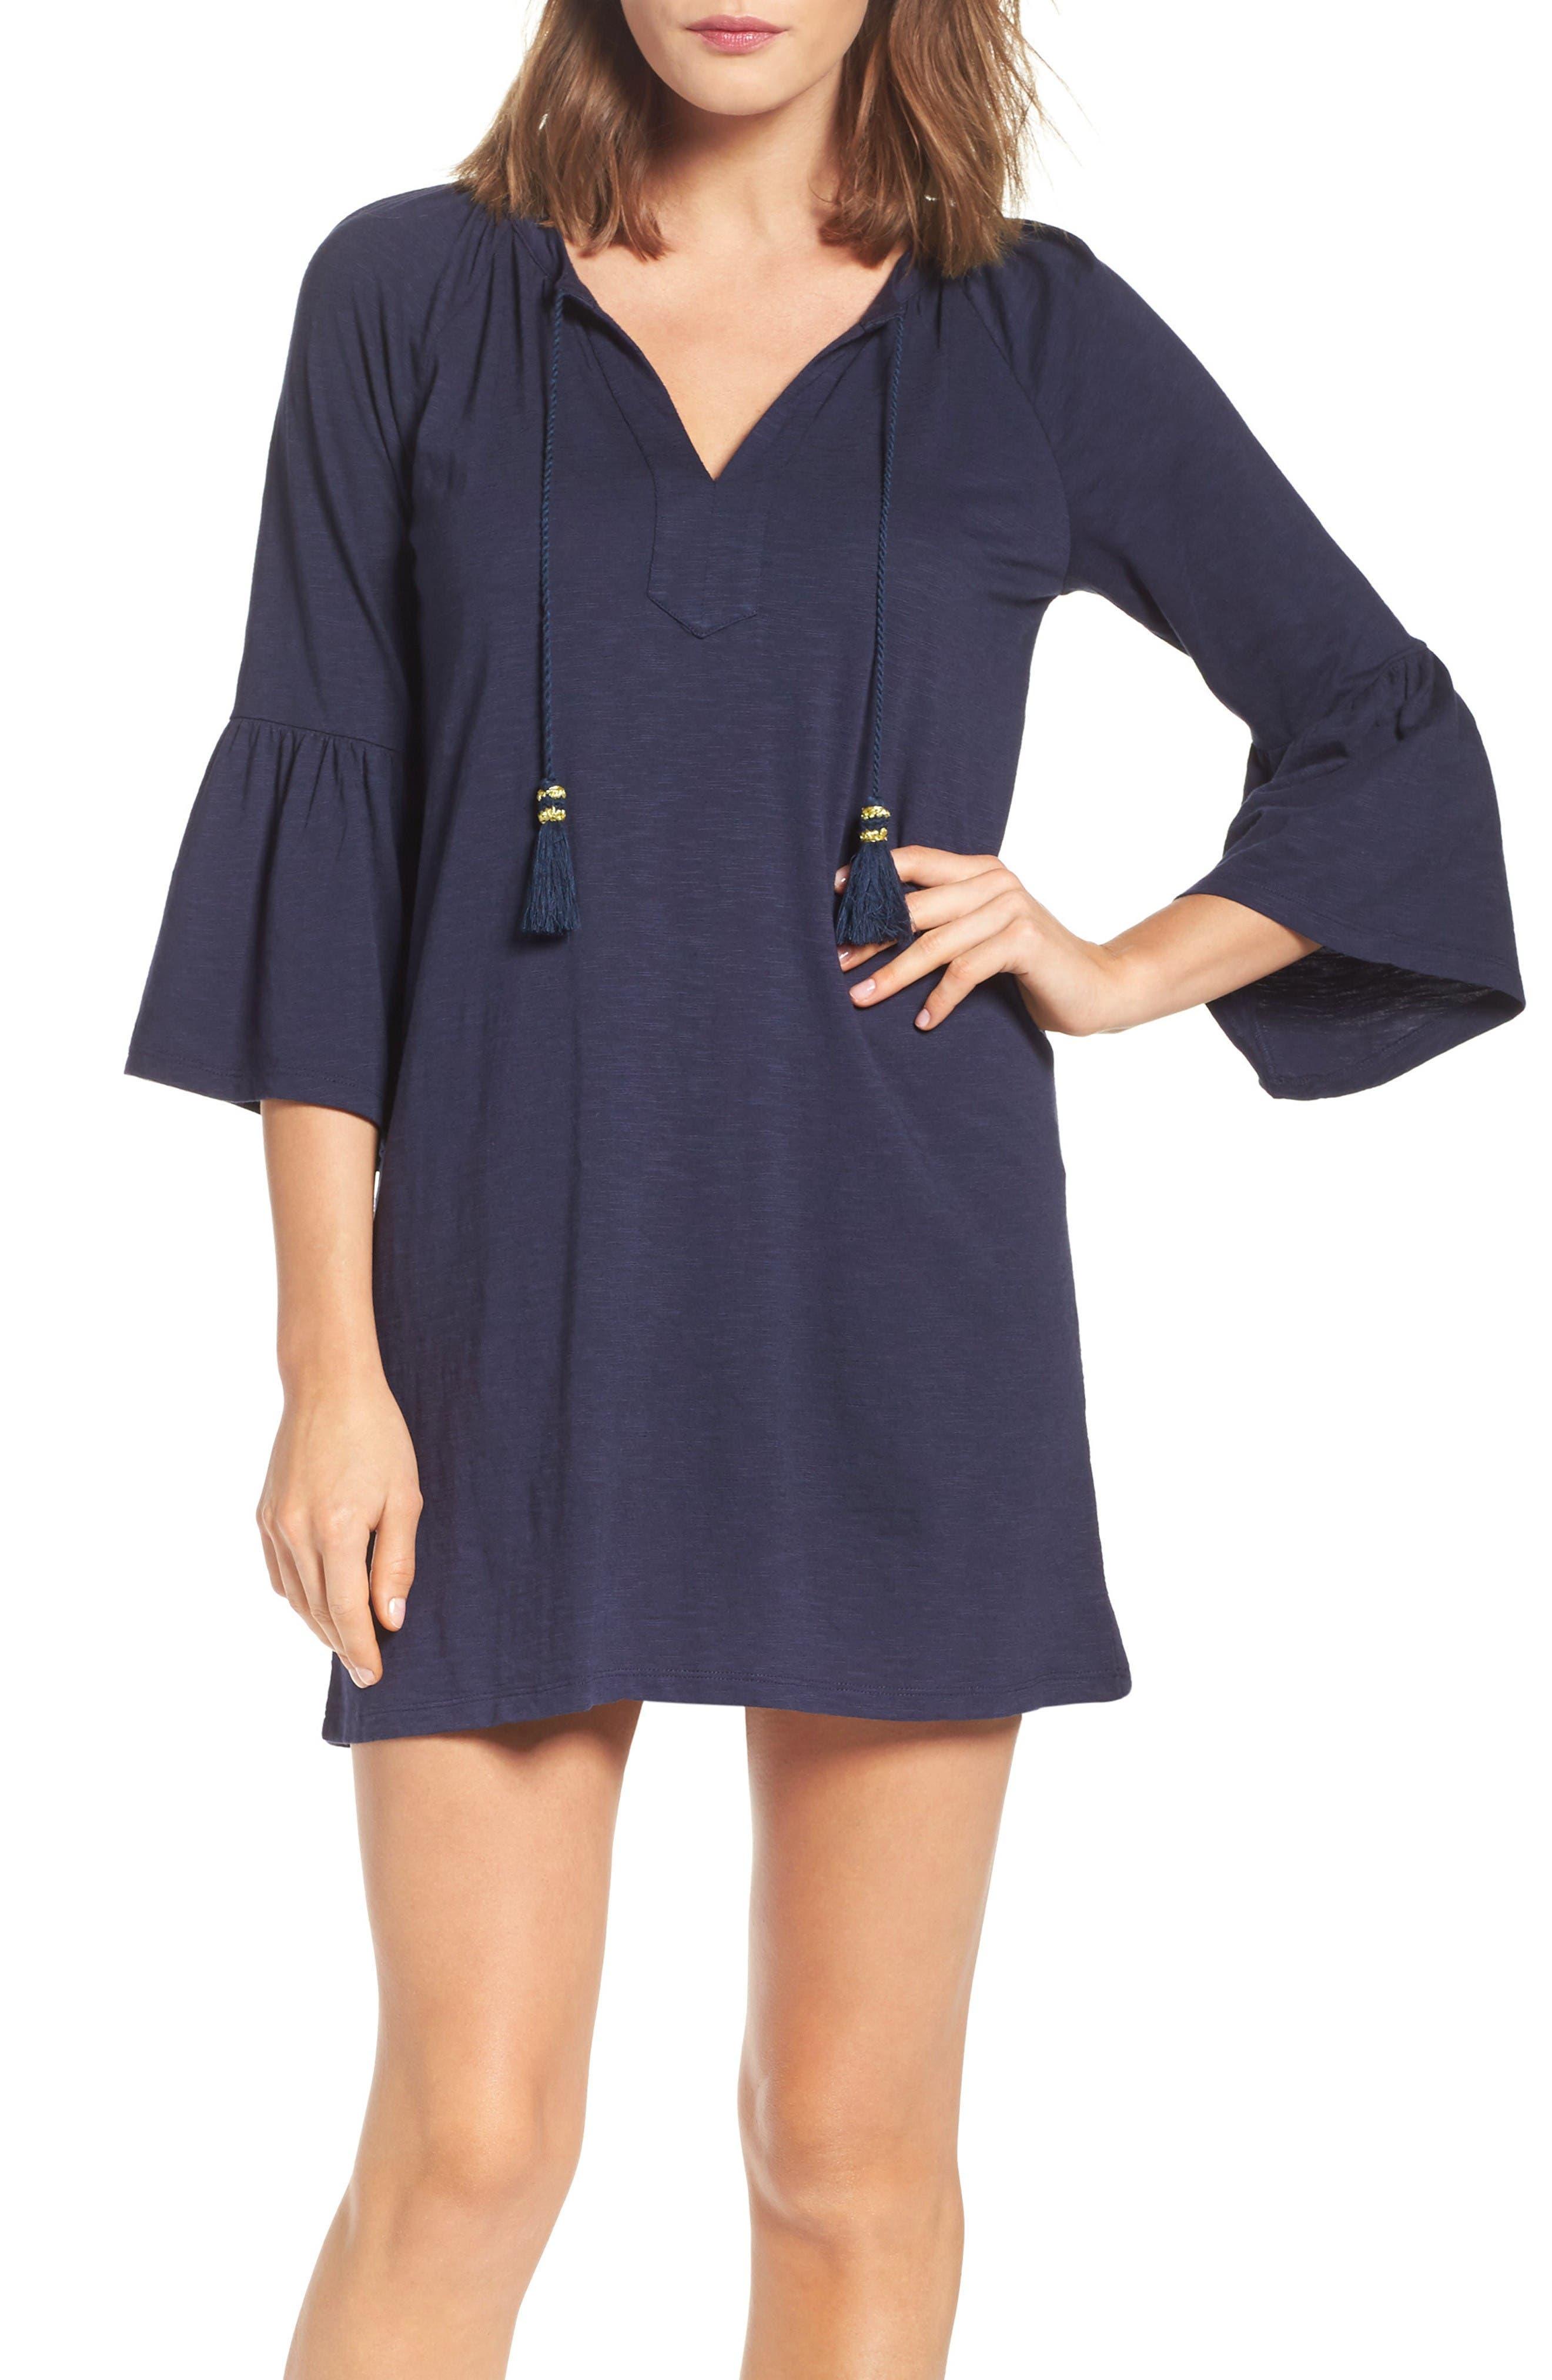 Main Image - Lilly Pulitzer® Del Lago Tunic Dress